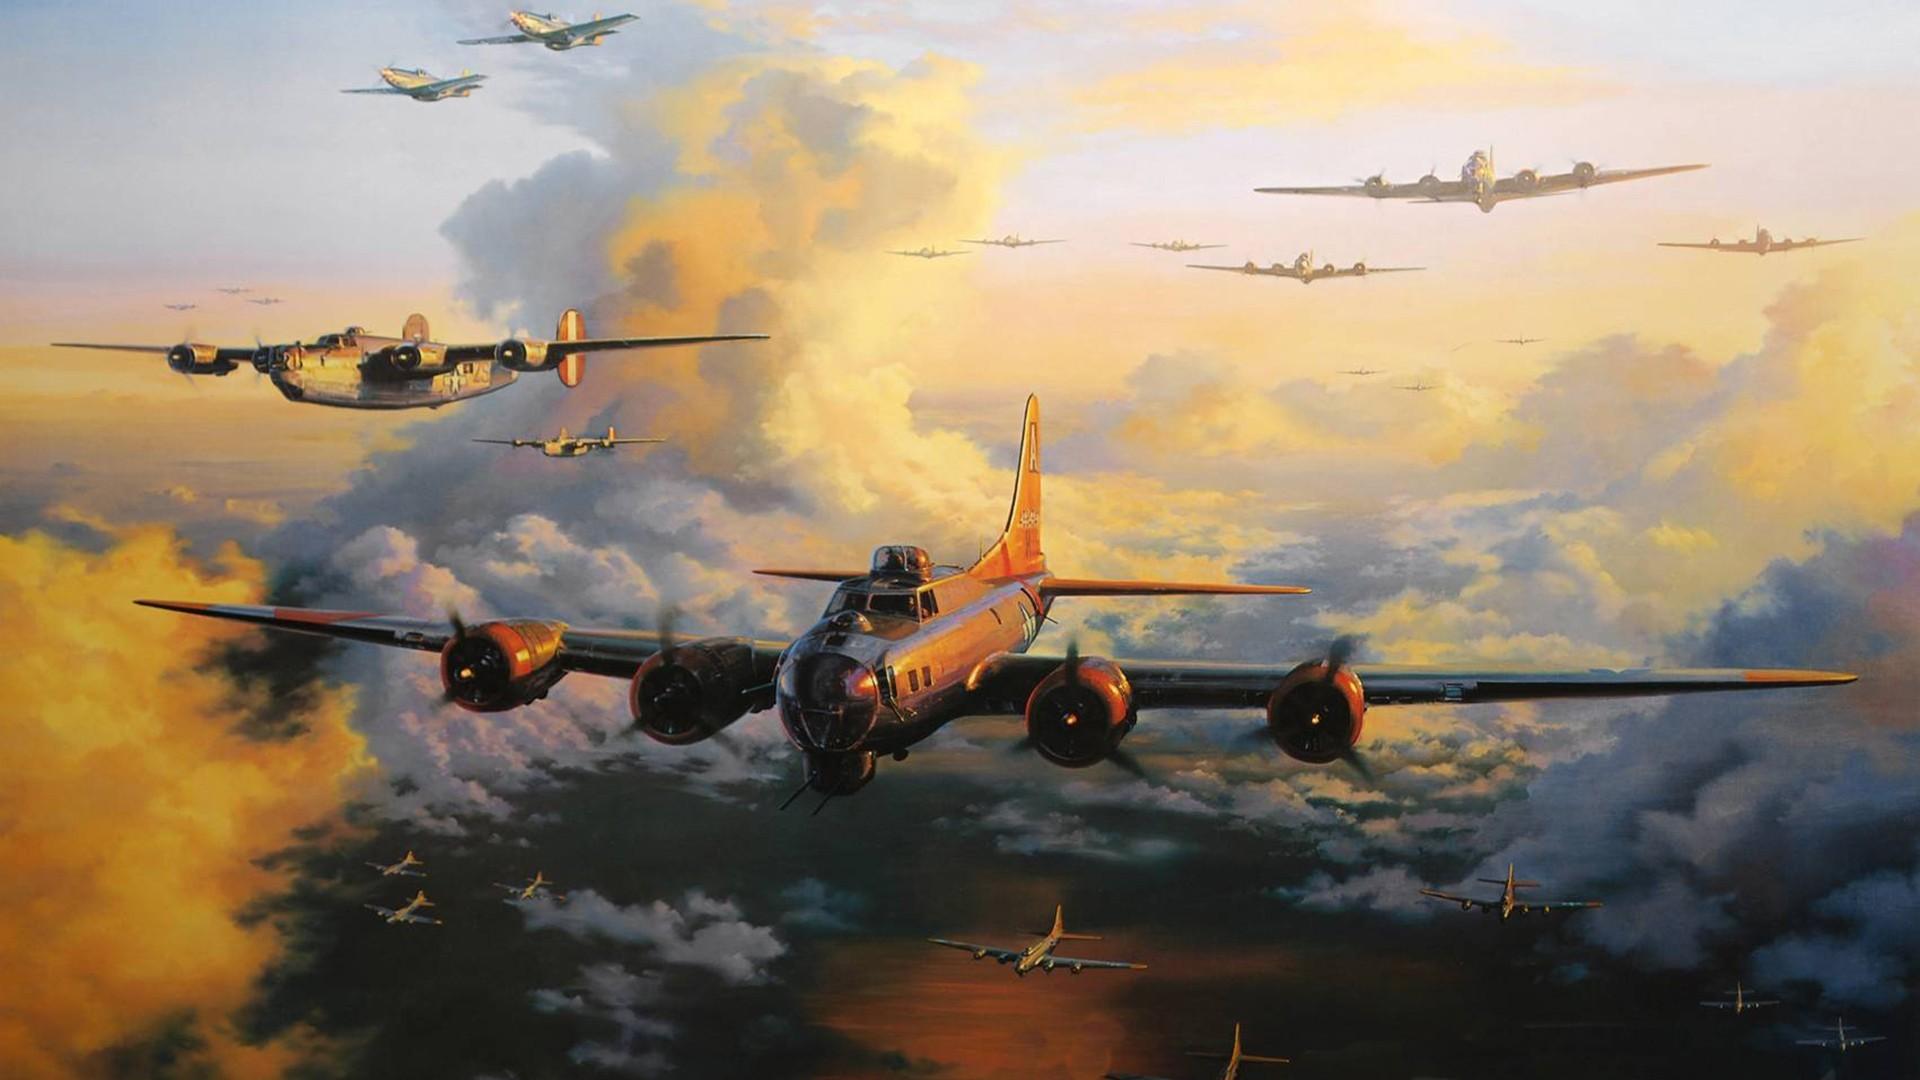 WW2 Airplane Wallpaper